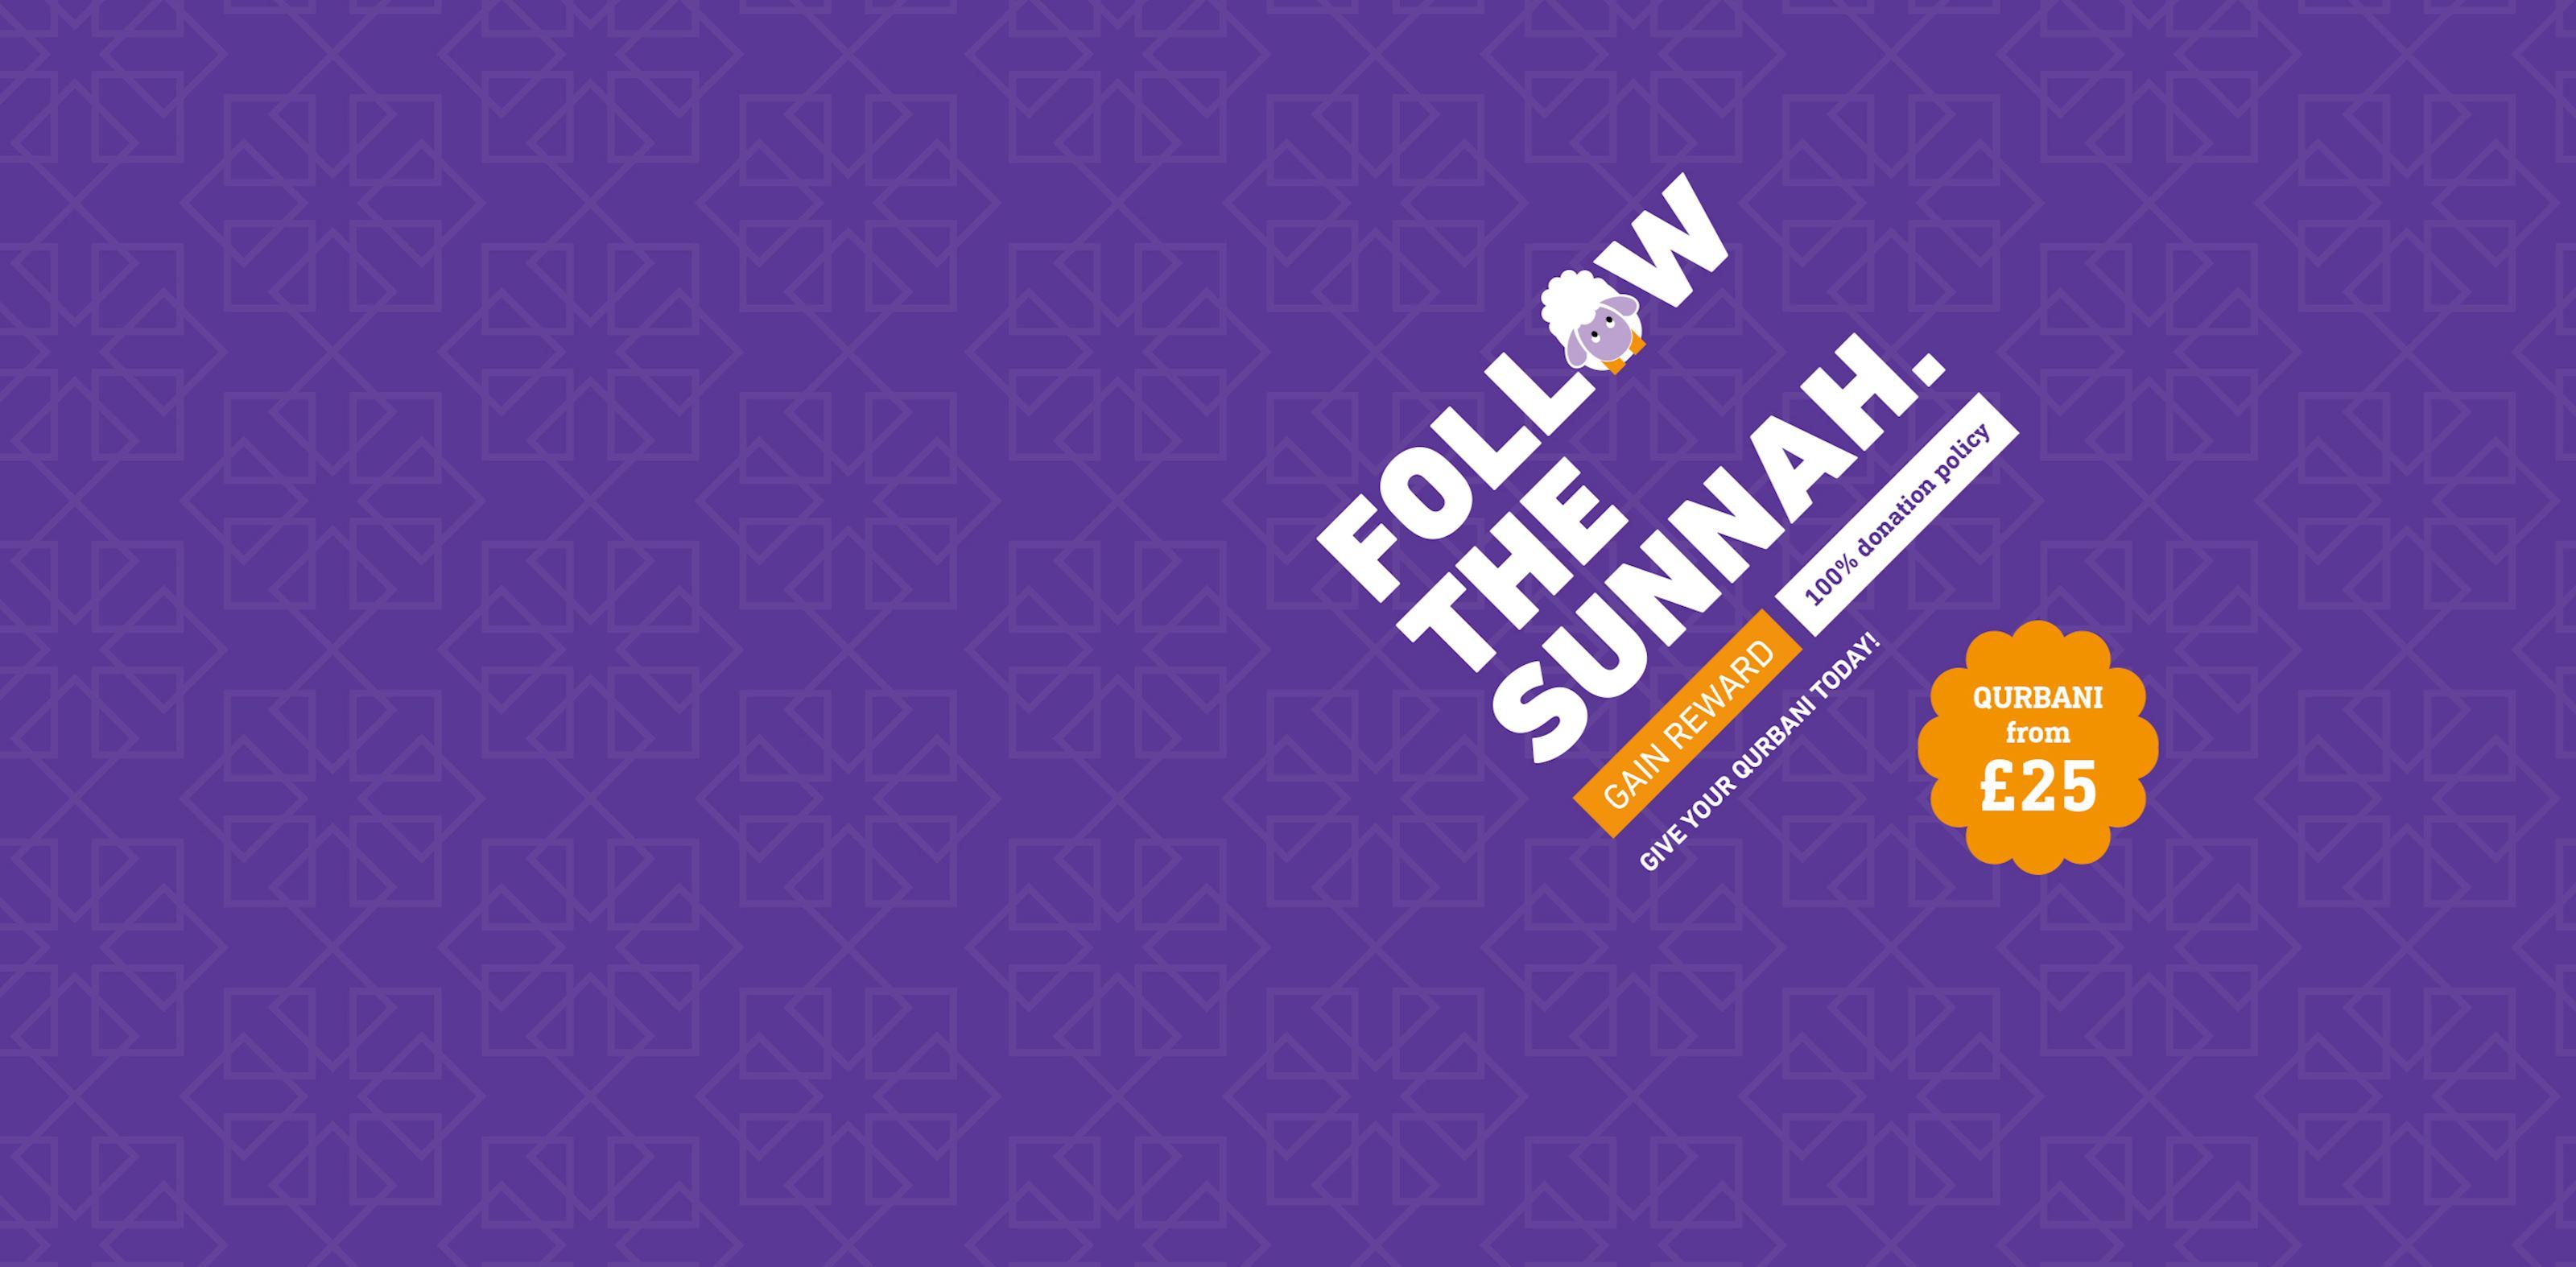 Qurbani - Follow the Sunnah